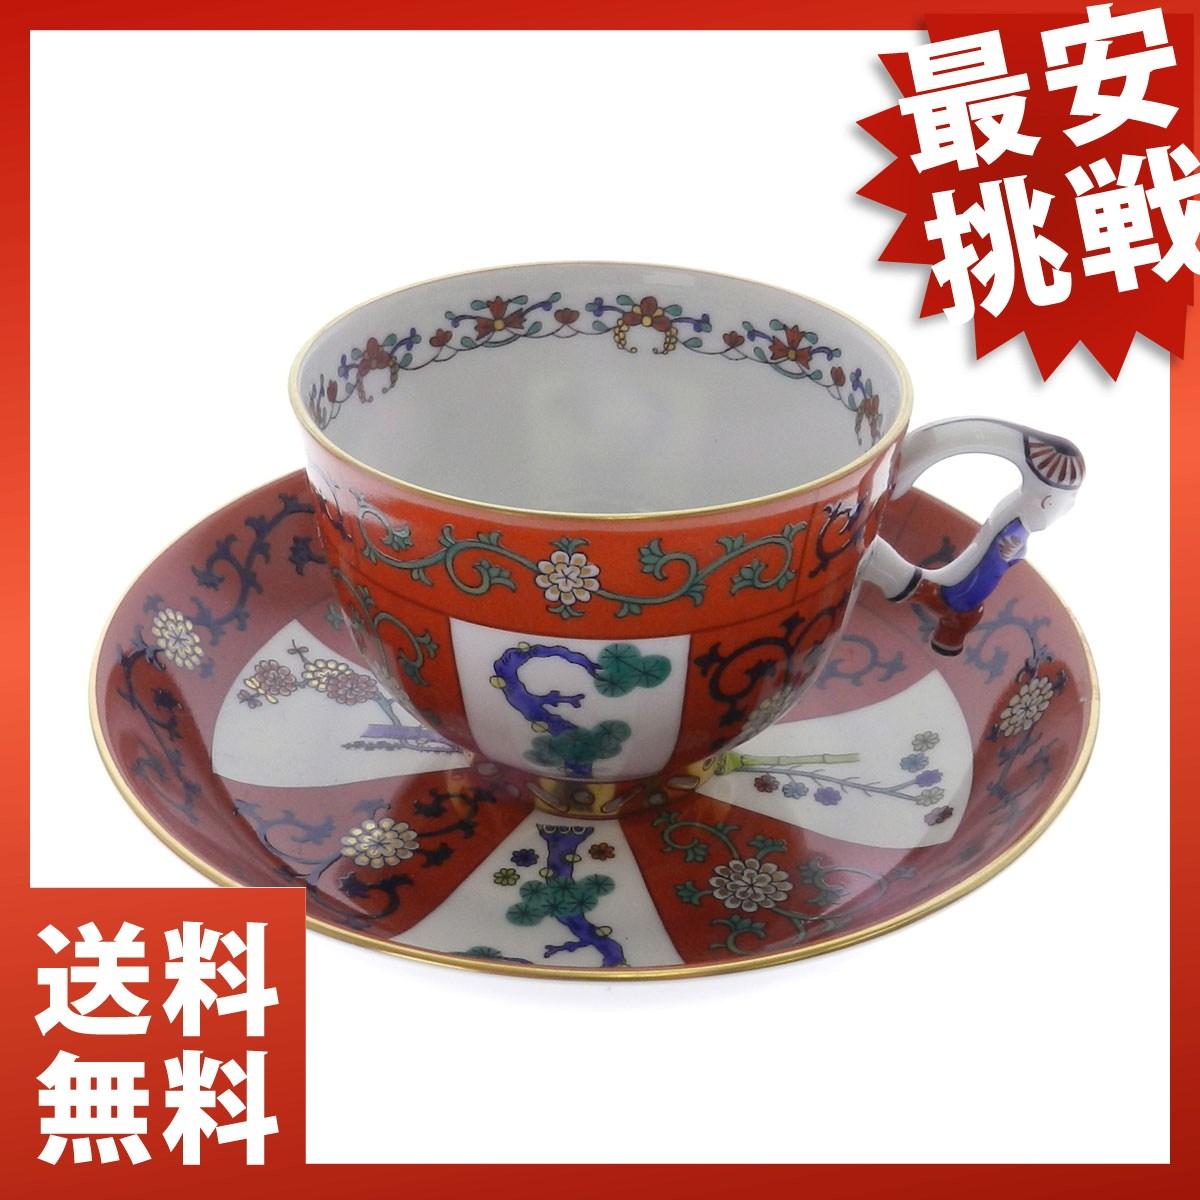 HEREND 手绘咖啡杯中国风 / ゲデレ 和西安红陶瓷男女皆宜